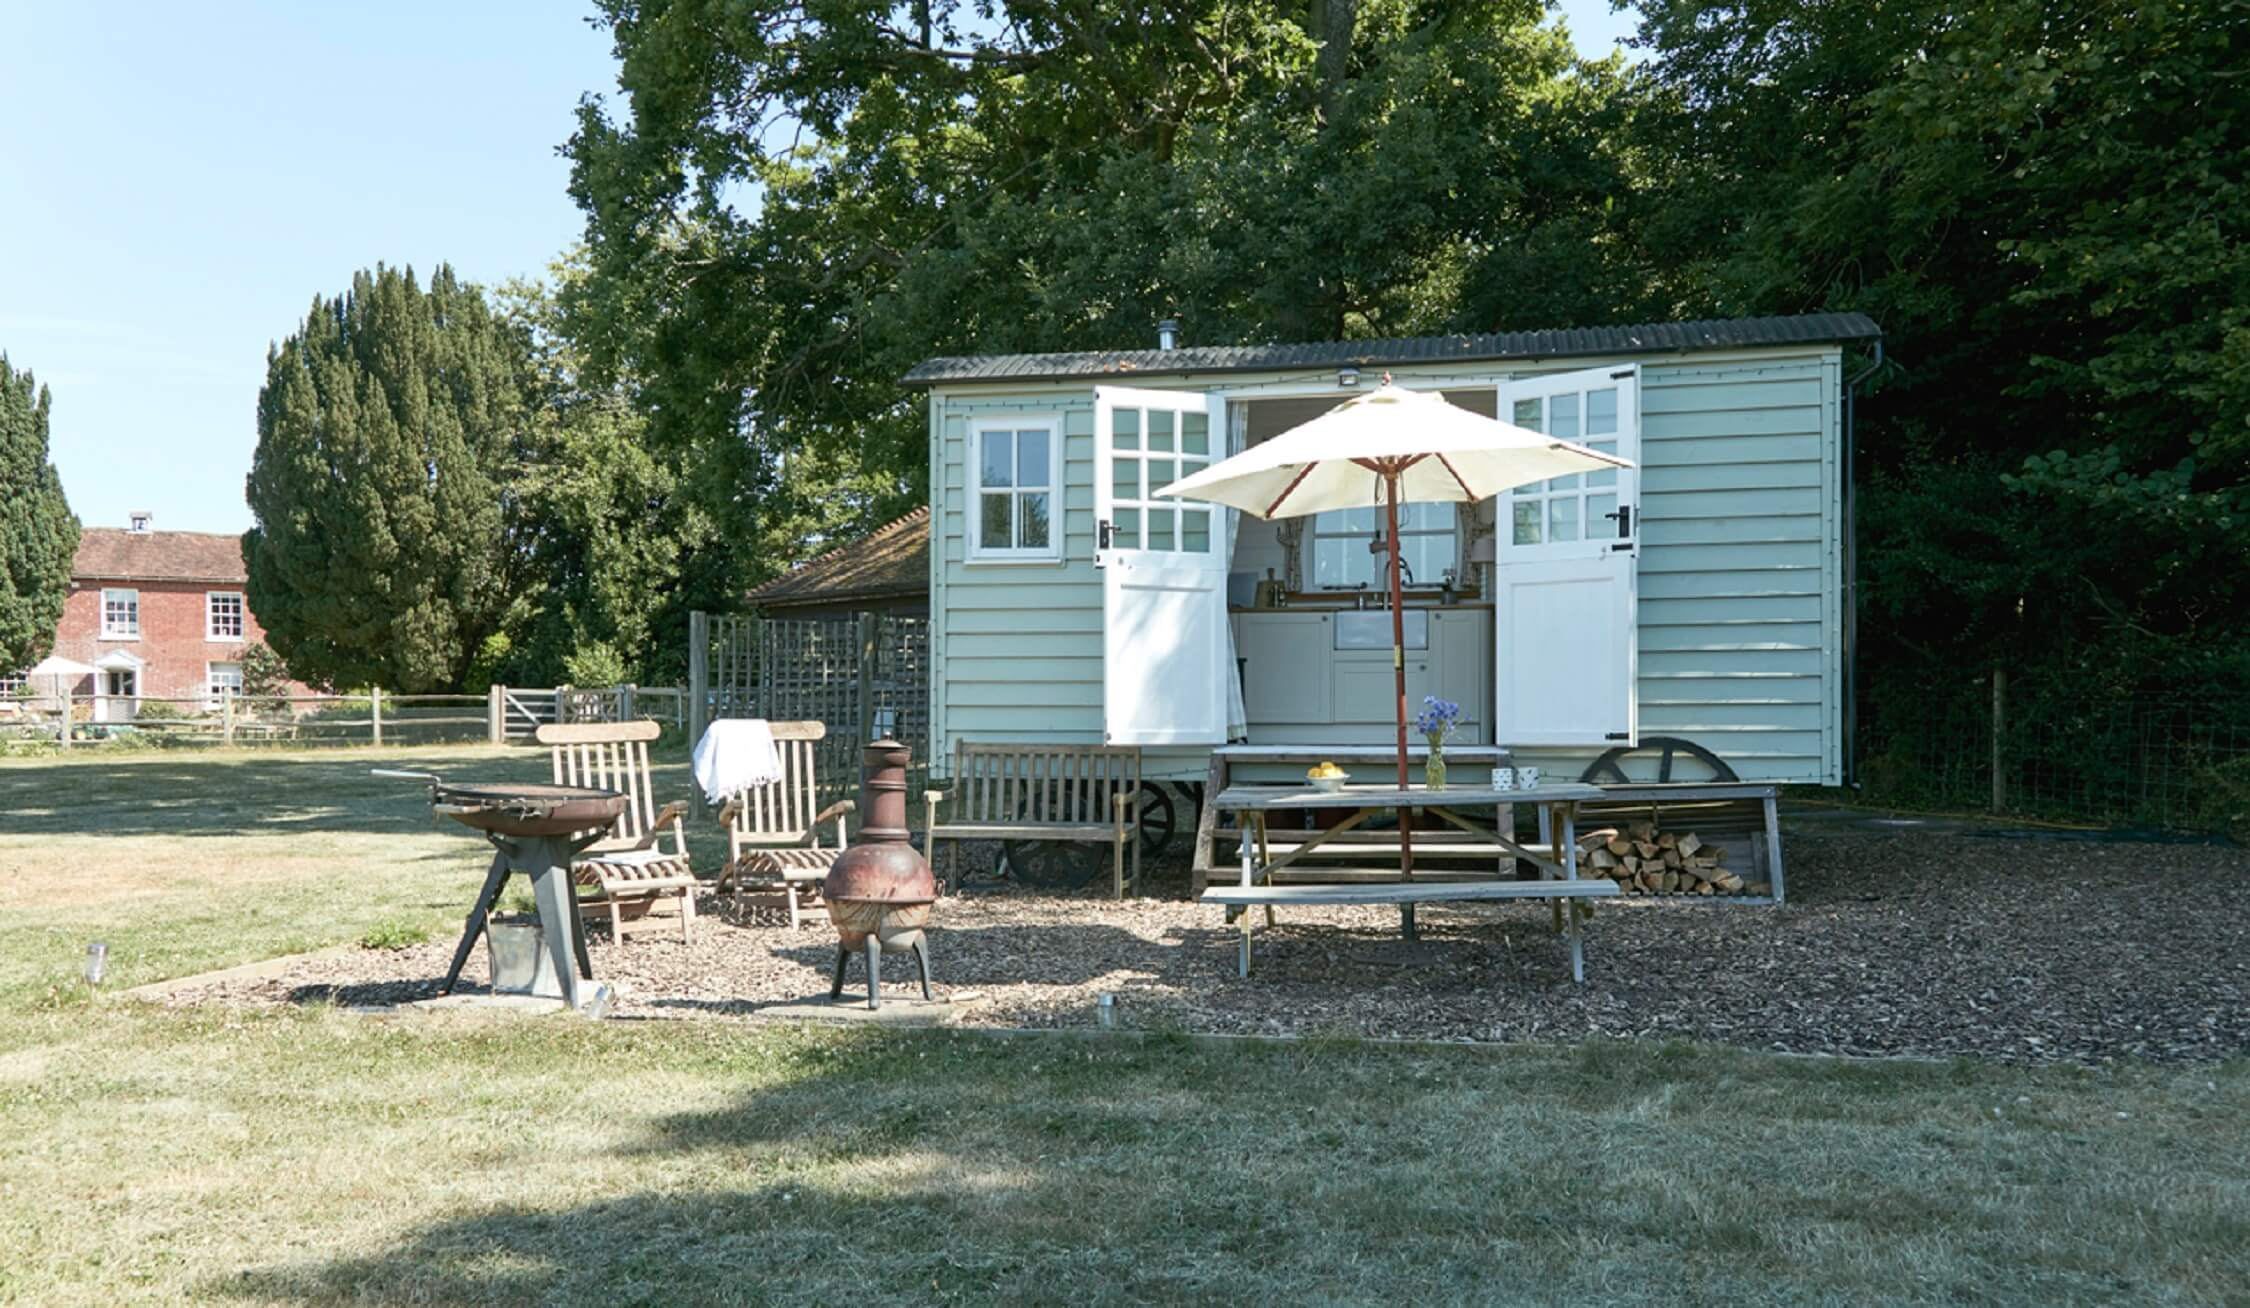 Buck's Green Shepherd's Hut